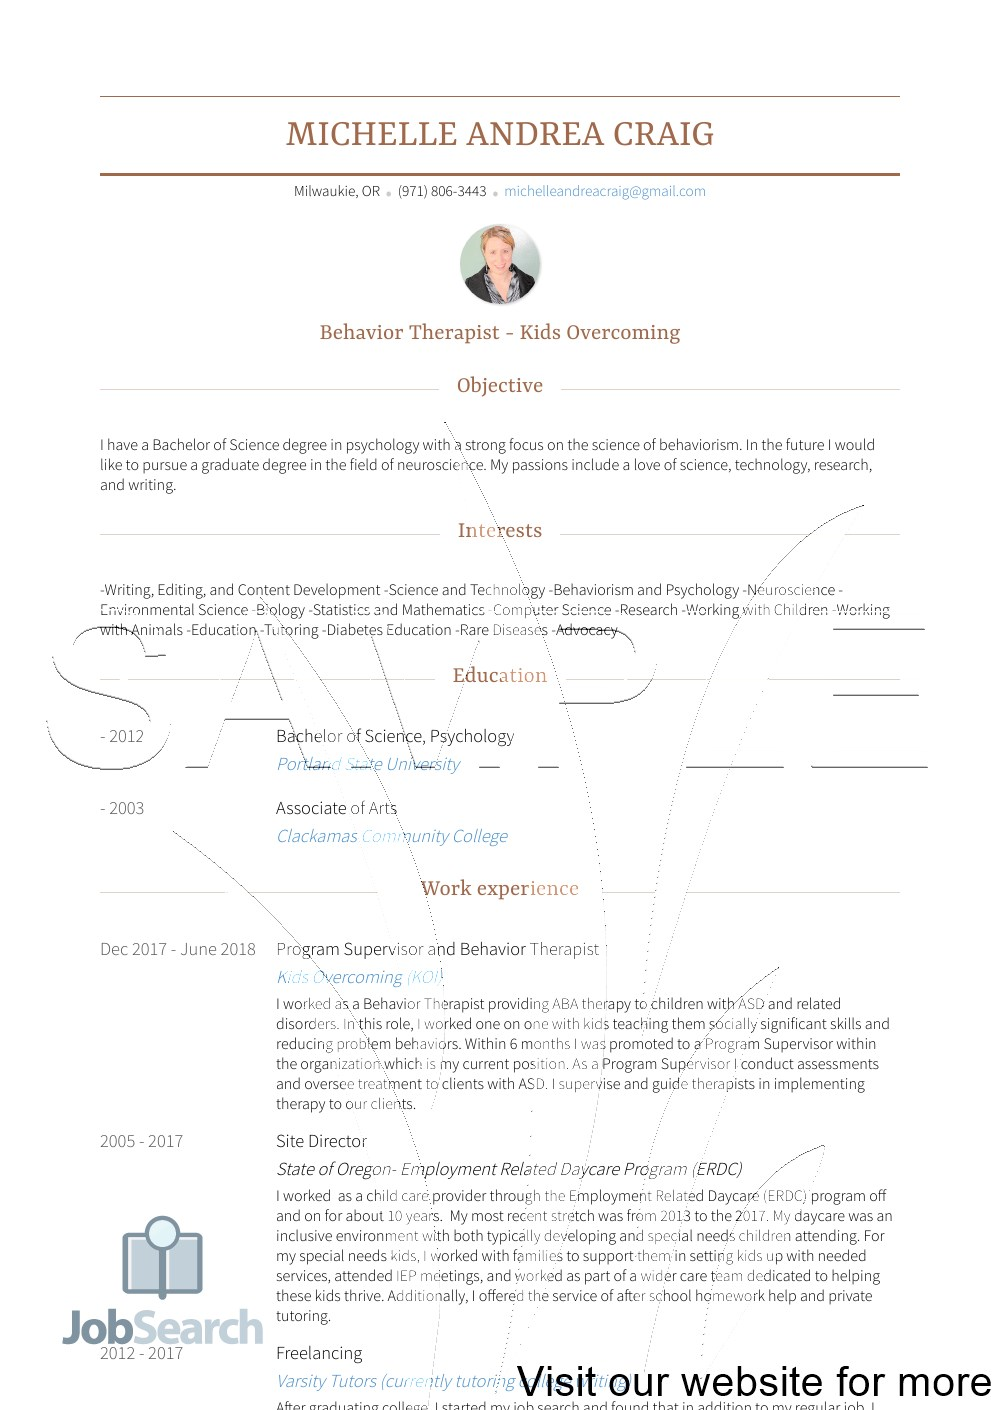 Sample Child Care Resume Objectives Australia 2020 in 2020